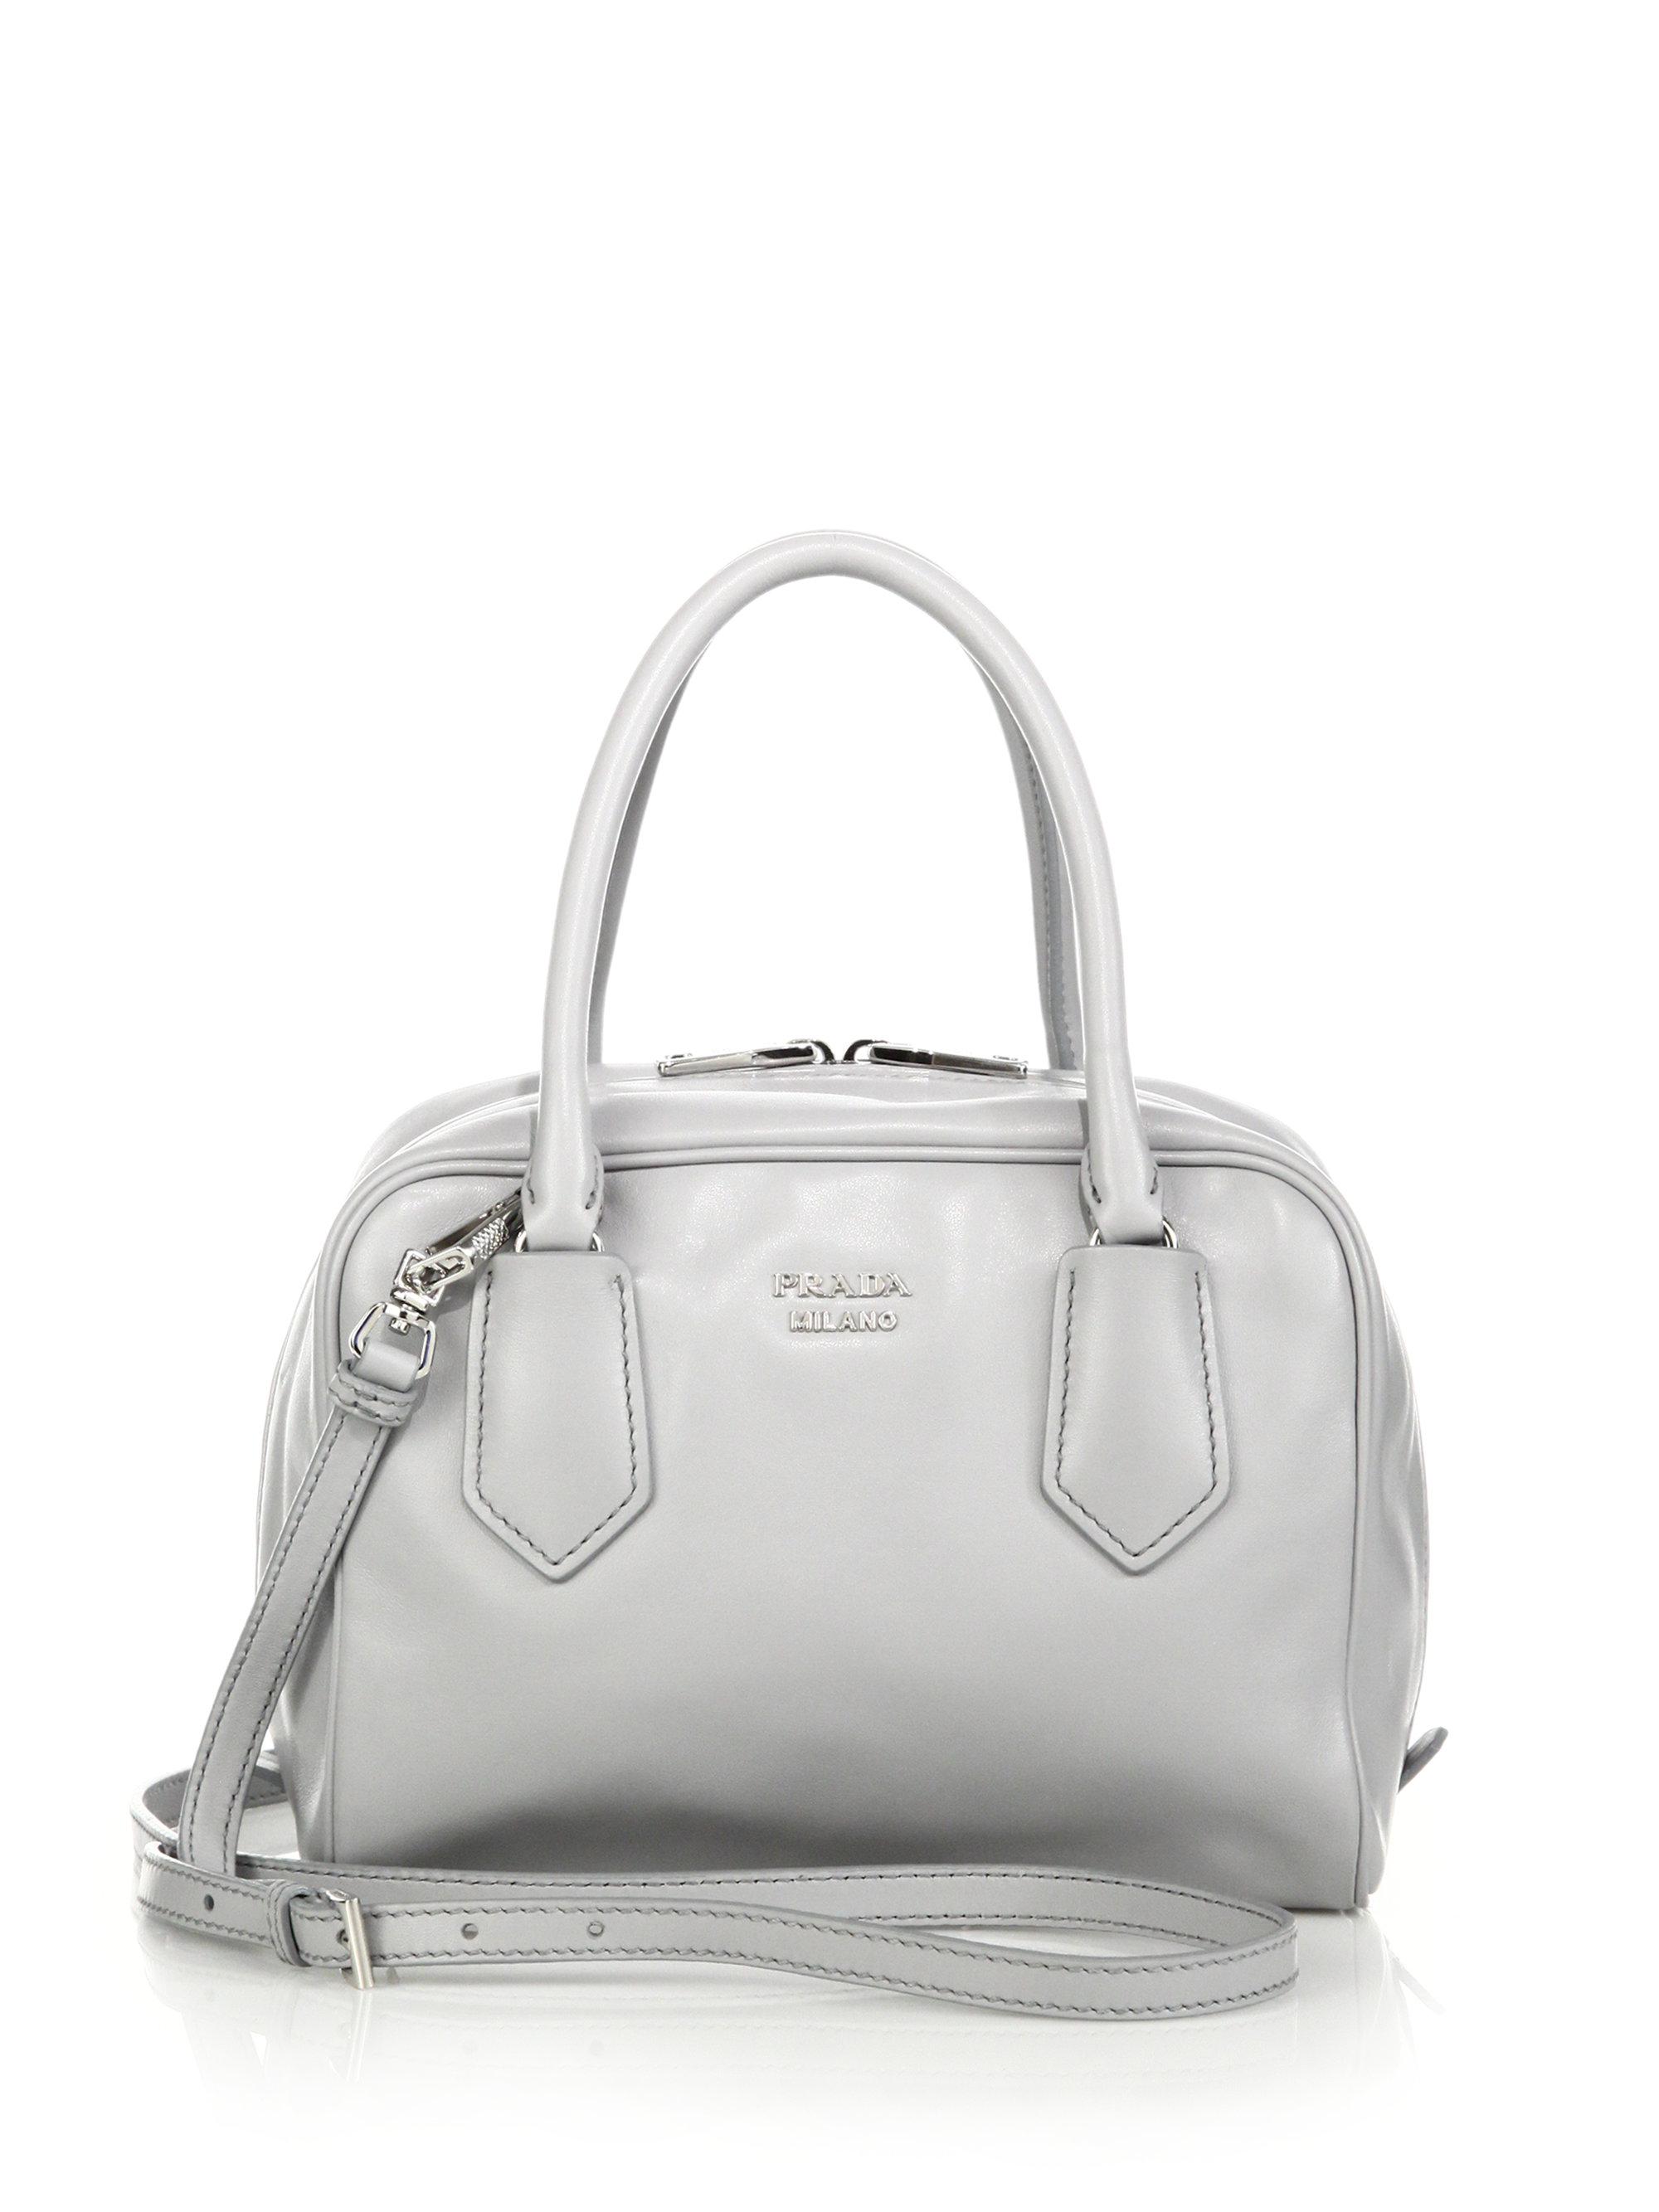 Prada small bag white/black